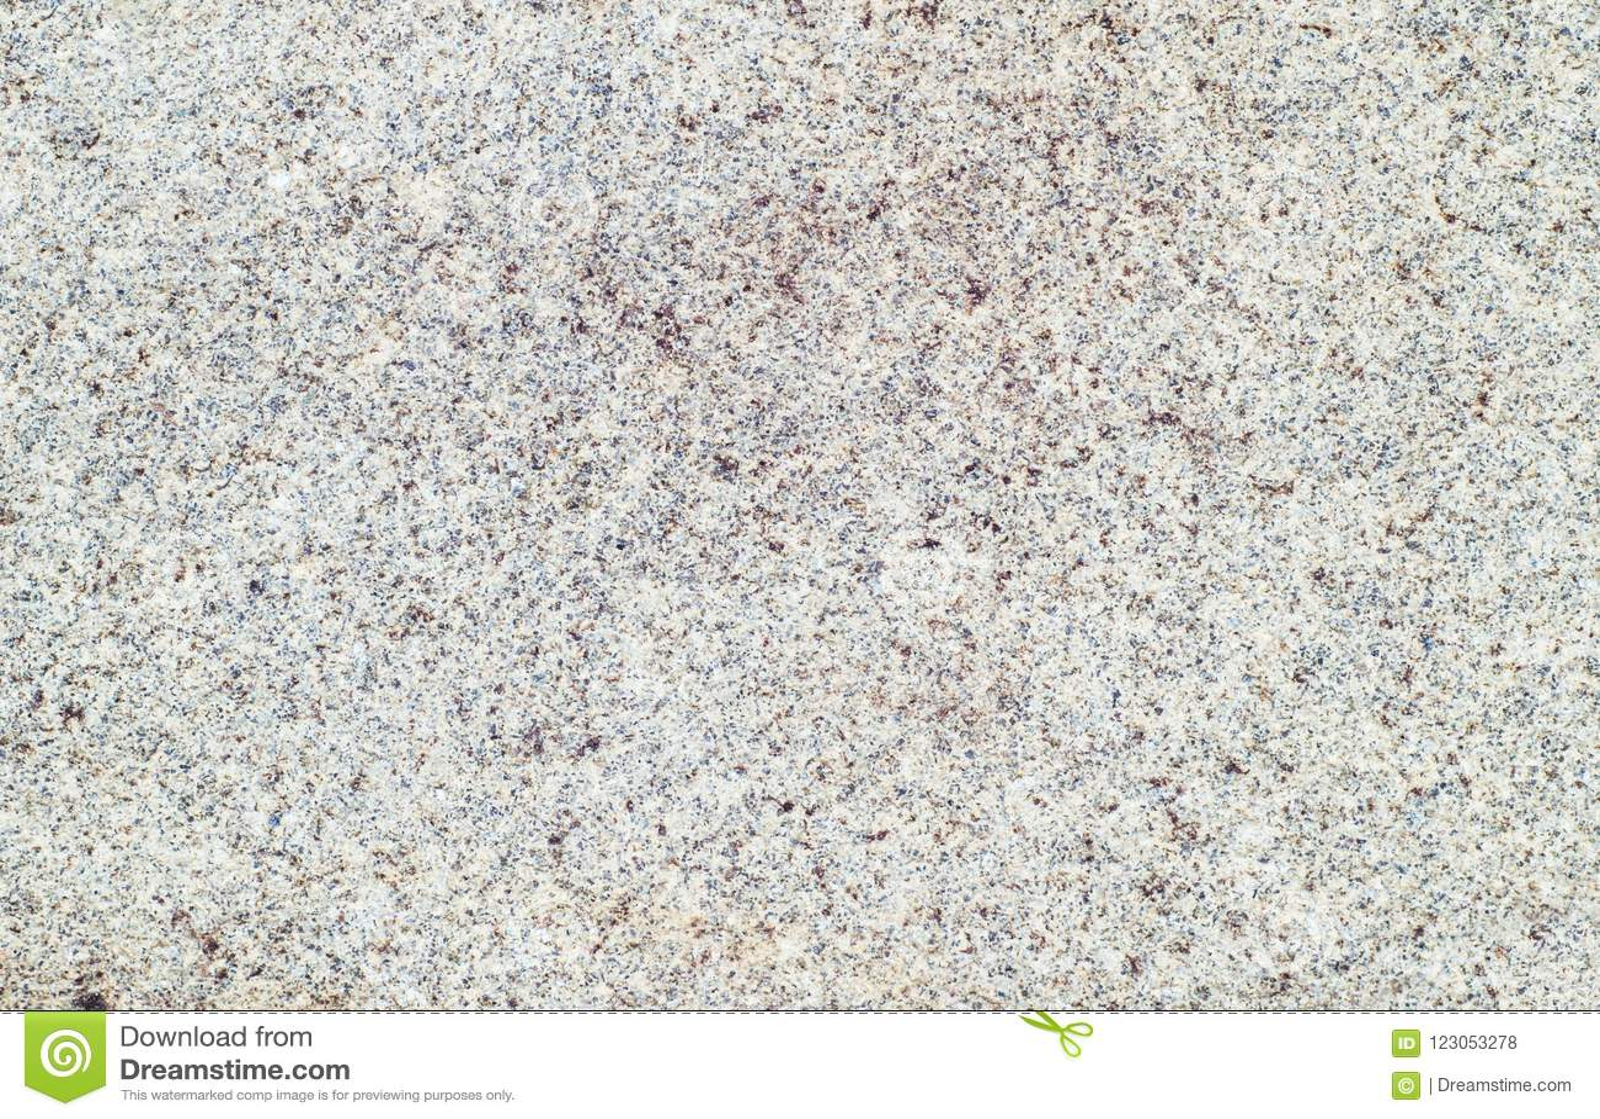 The texture of marigold stone, macro photography, rock